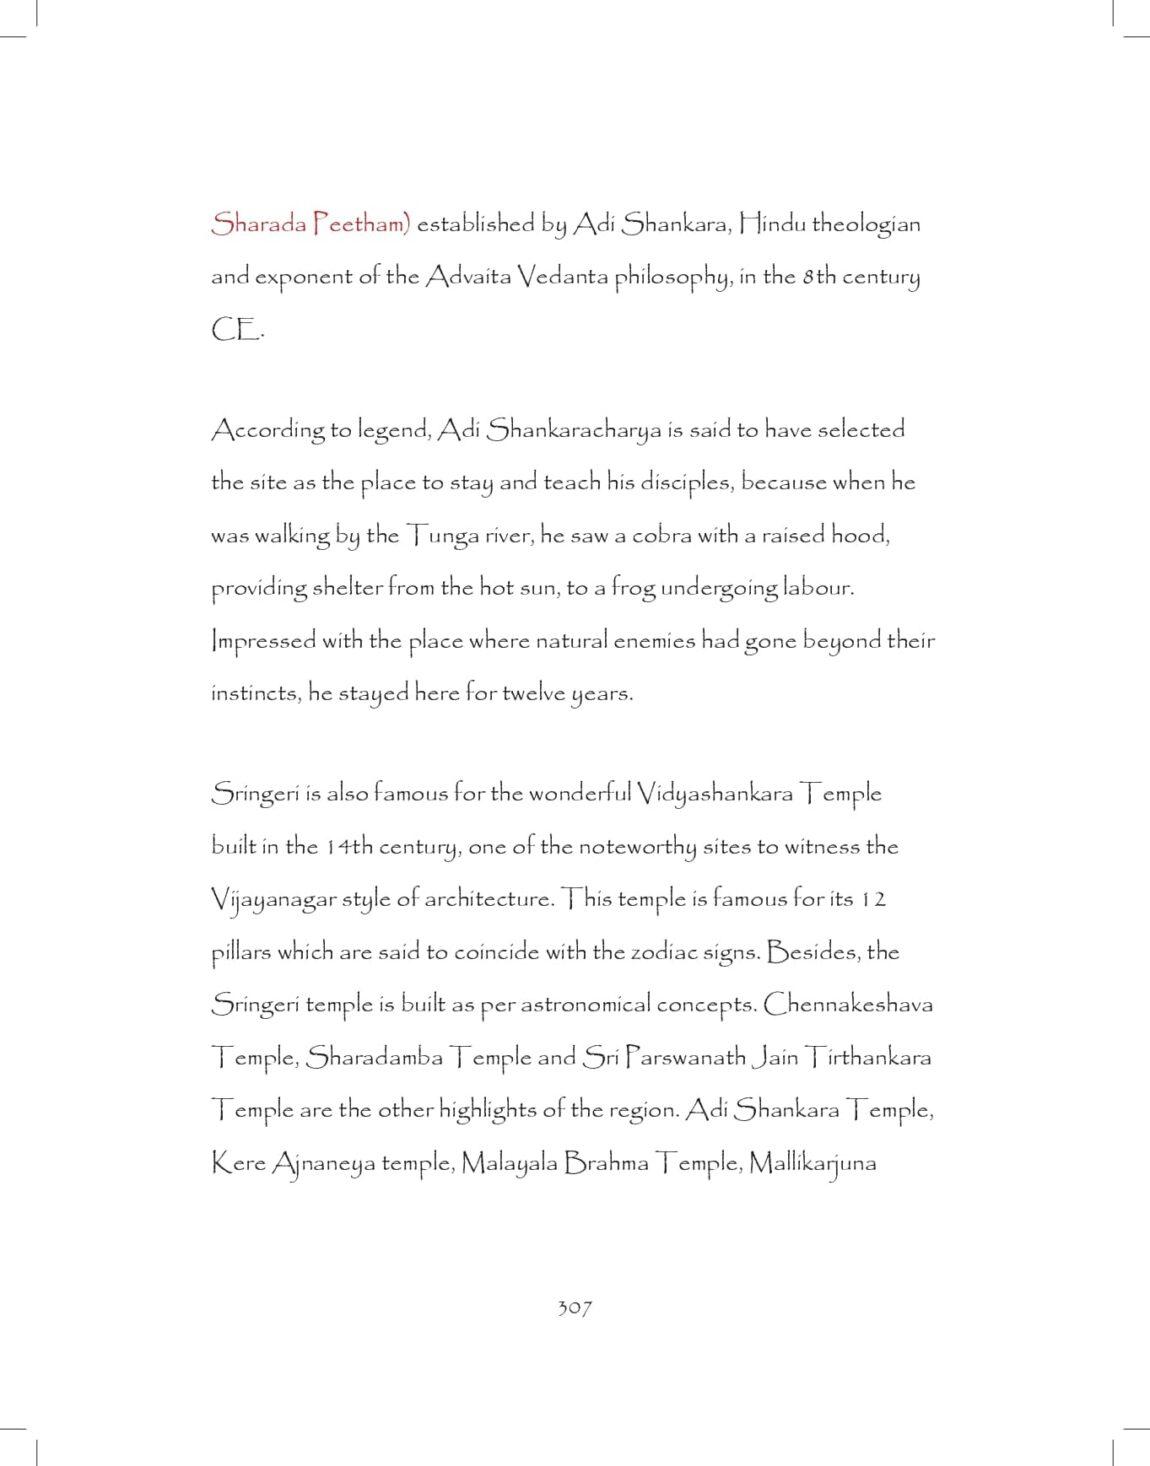 Ganesh-print_pages-to-jpg-0307.jpg